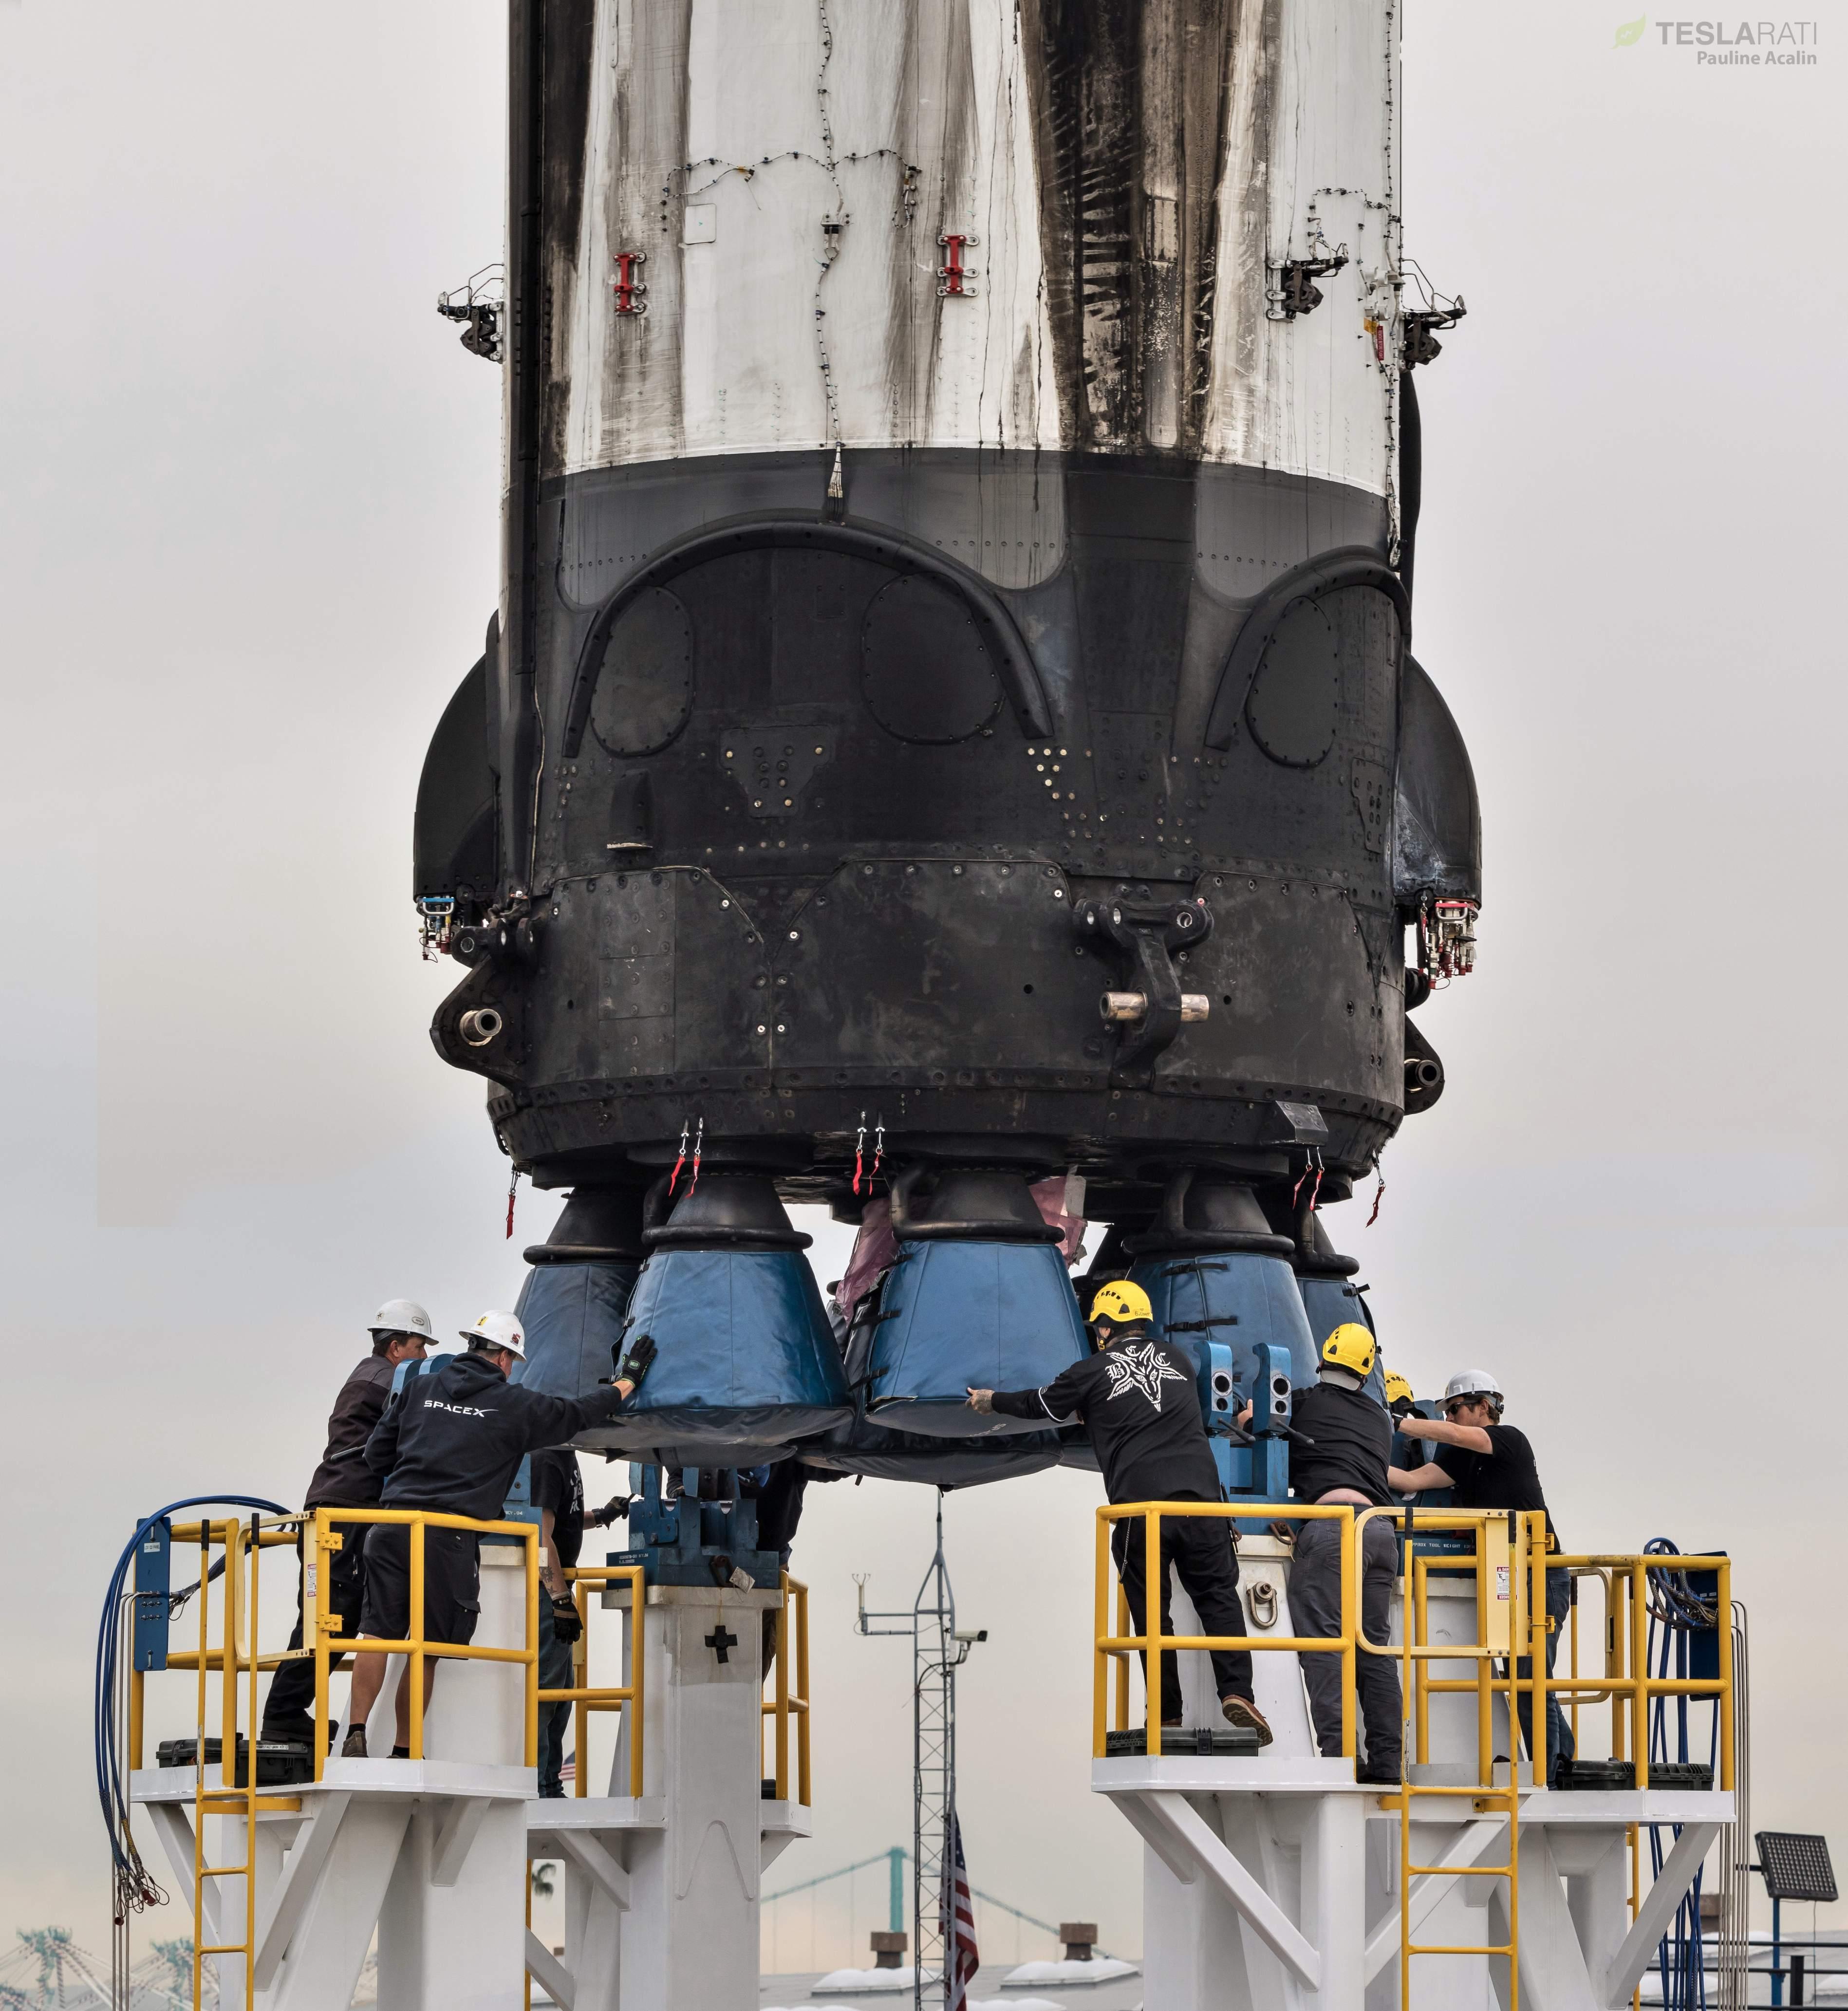 Falcon 9 B1046 SSO-A horizontal flip 121018 (Pauline Acalin) 9(c)